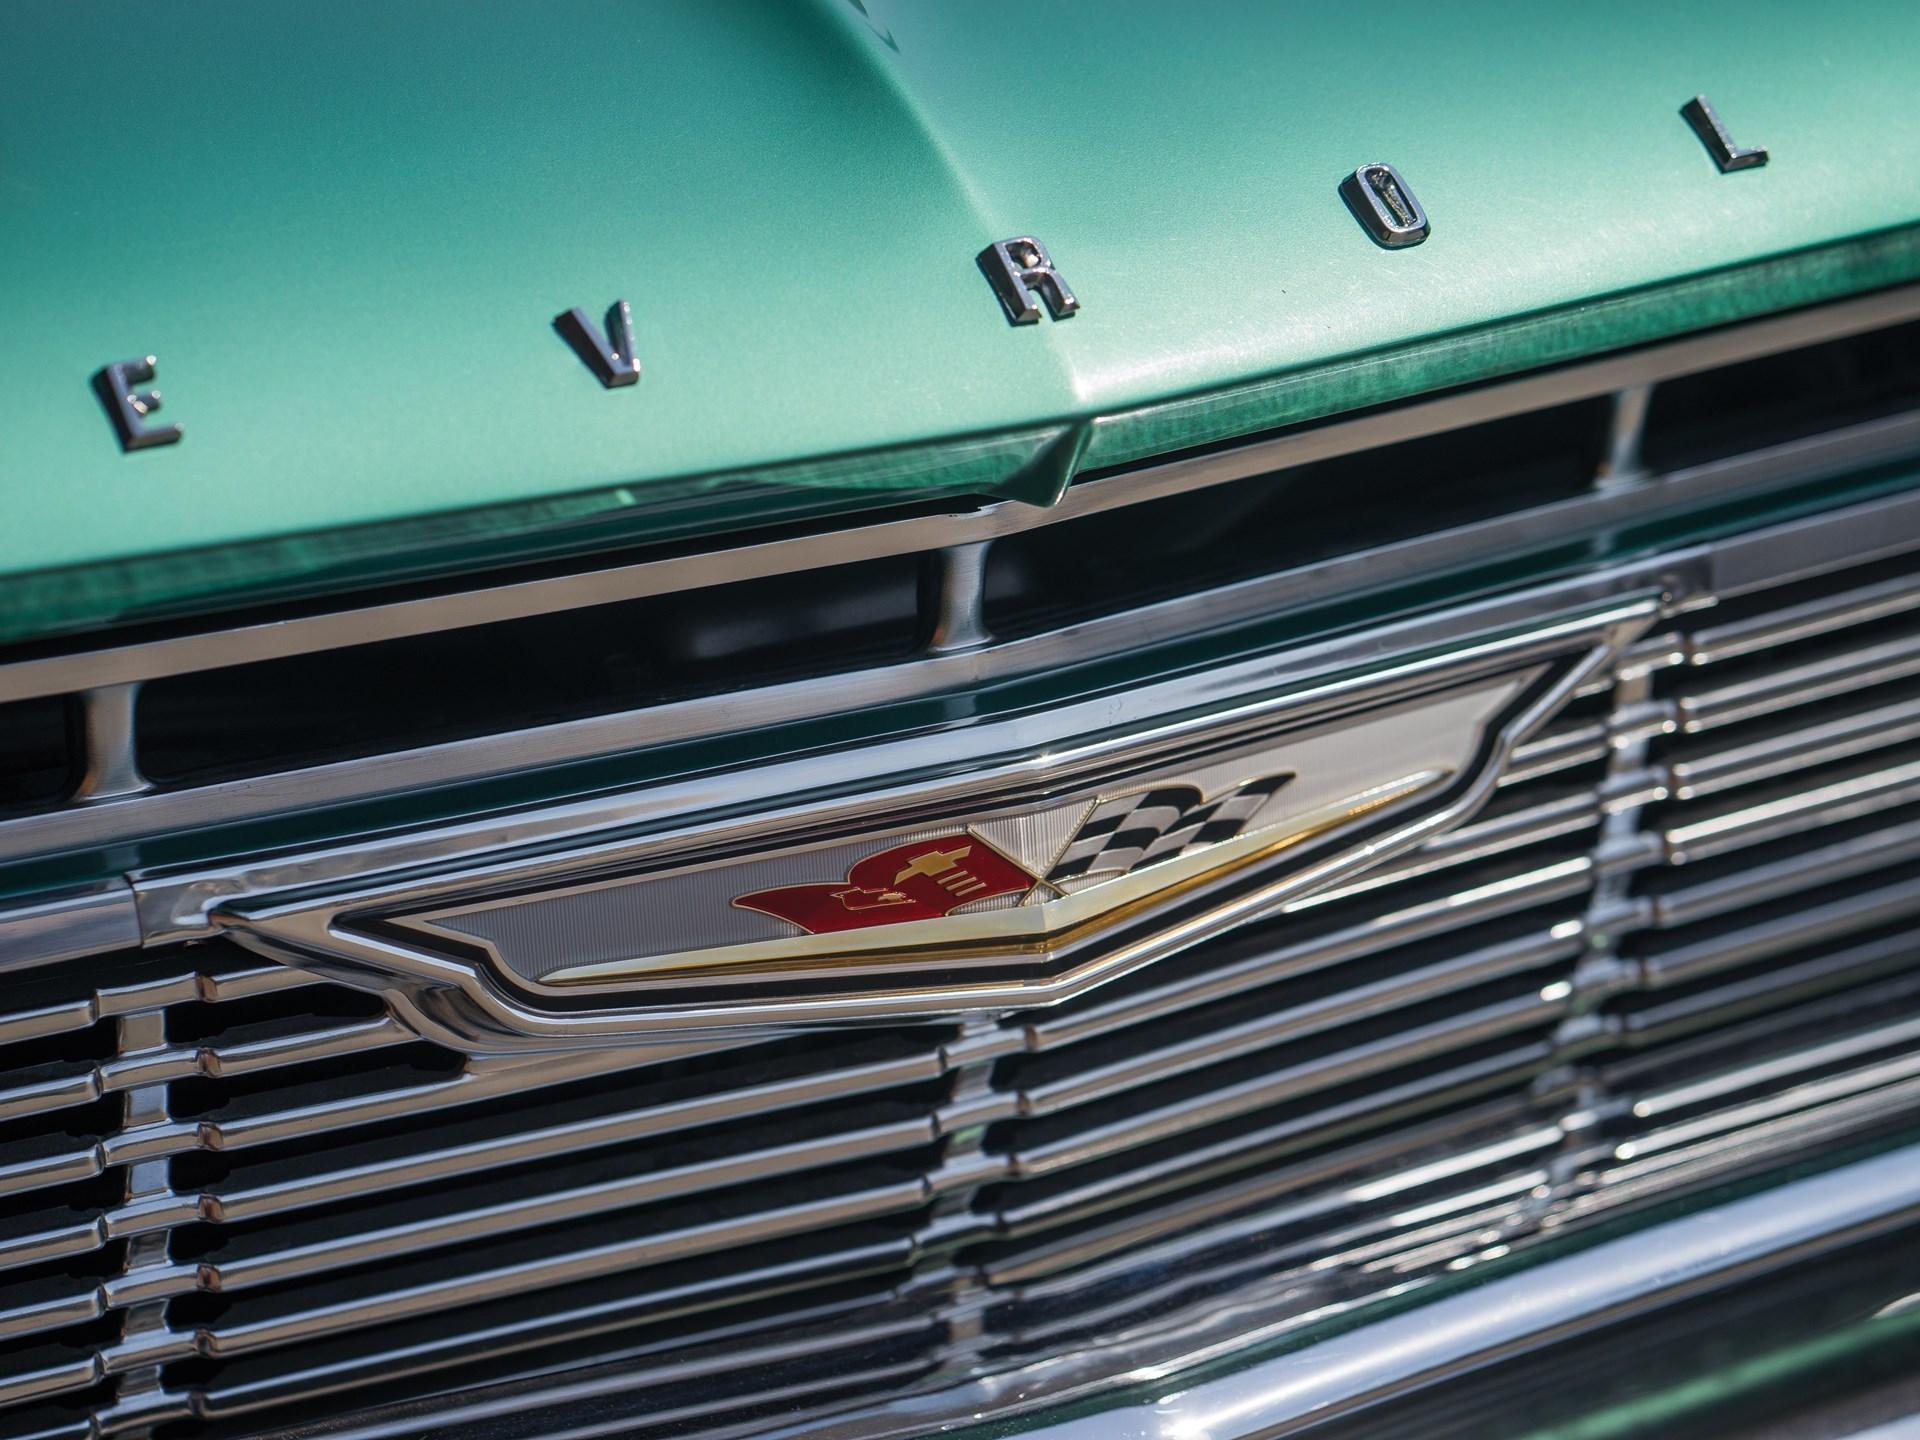 Rm Sothebys 1961 Chevrolet Impala Ss 409 Sport Coupe Hershey 2017 Chevy